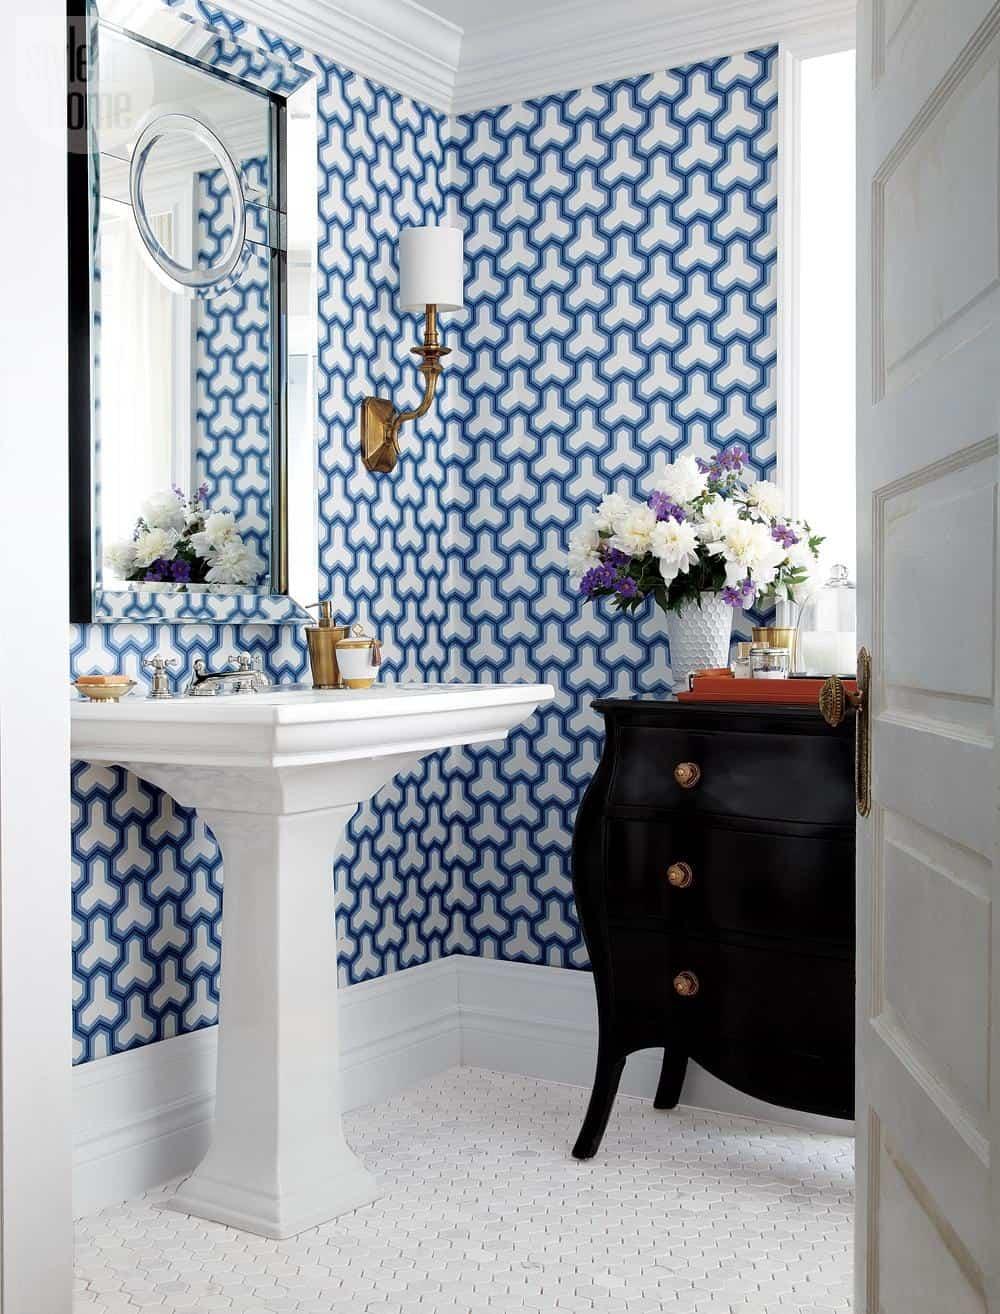 Small Bathroom With Wallpaper Bathroom Wallpaper Ideas Uk 768x1009 Download Hd Wallpaper Wallpapertip